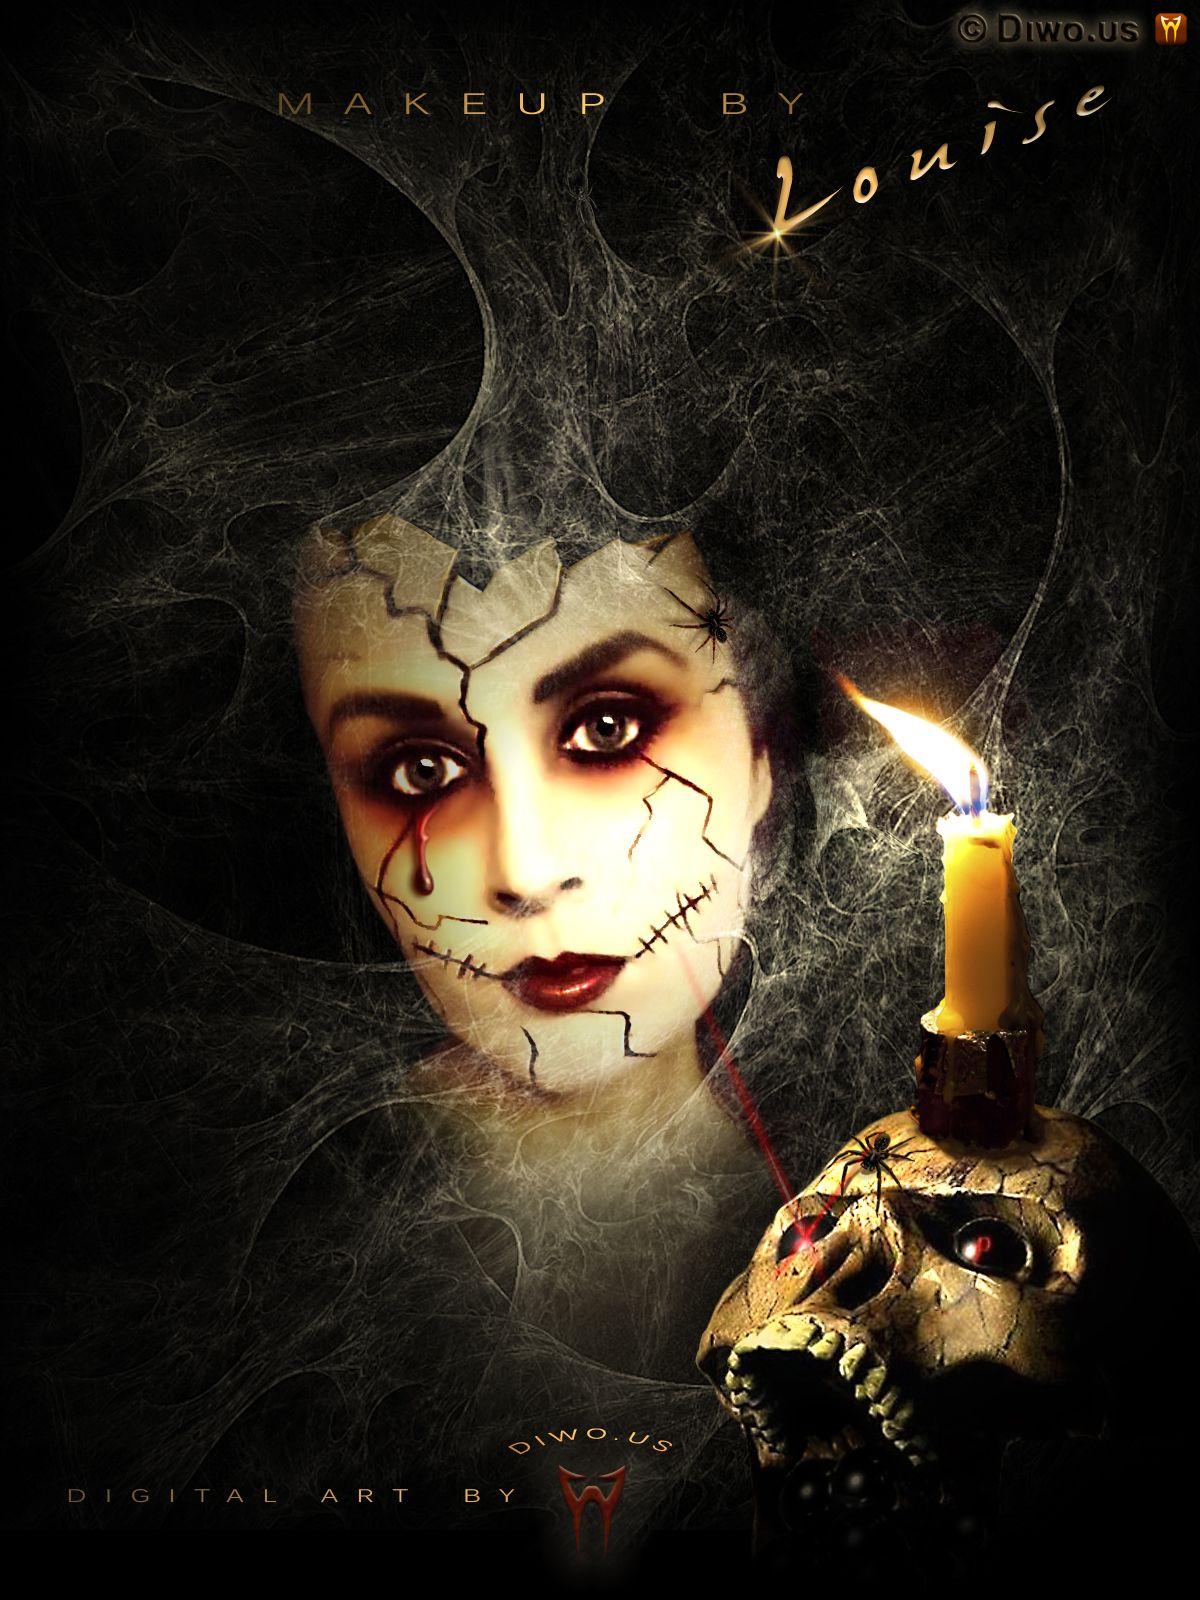 Diwous - MakeUp by Louise McDonagh, Halloween, Digital Art, paintbrush, photomontage, photo, manipulation, scary, skull, candle, spider, net, web, broken, porcelain, doll, fotomontáž, rozbitá panenka, lebka, svíčka, pavouk, pavučina